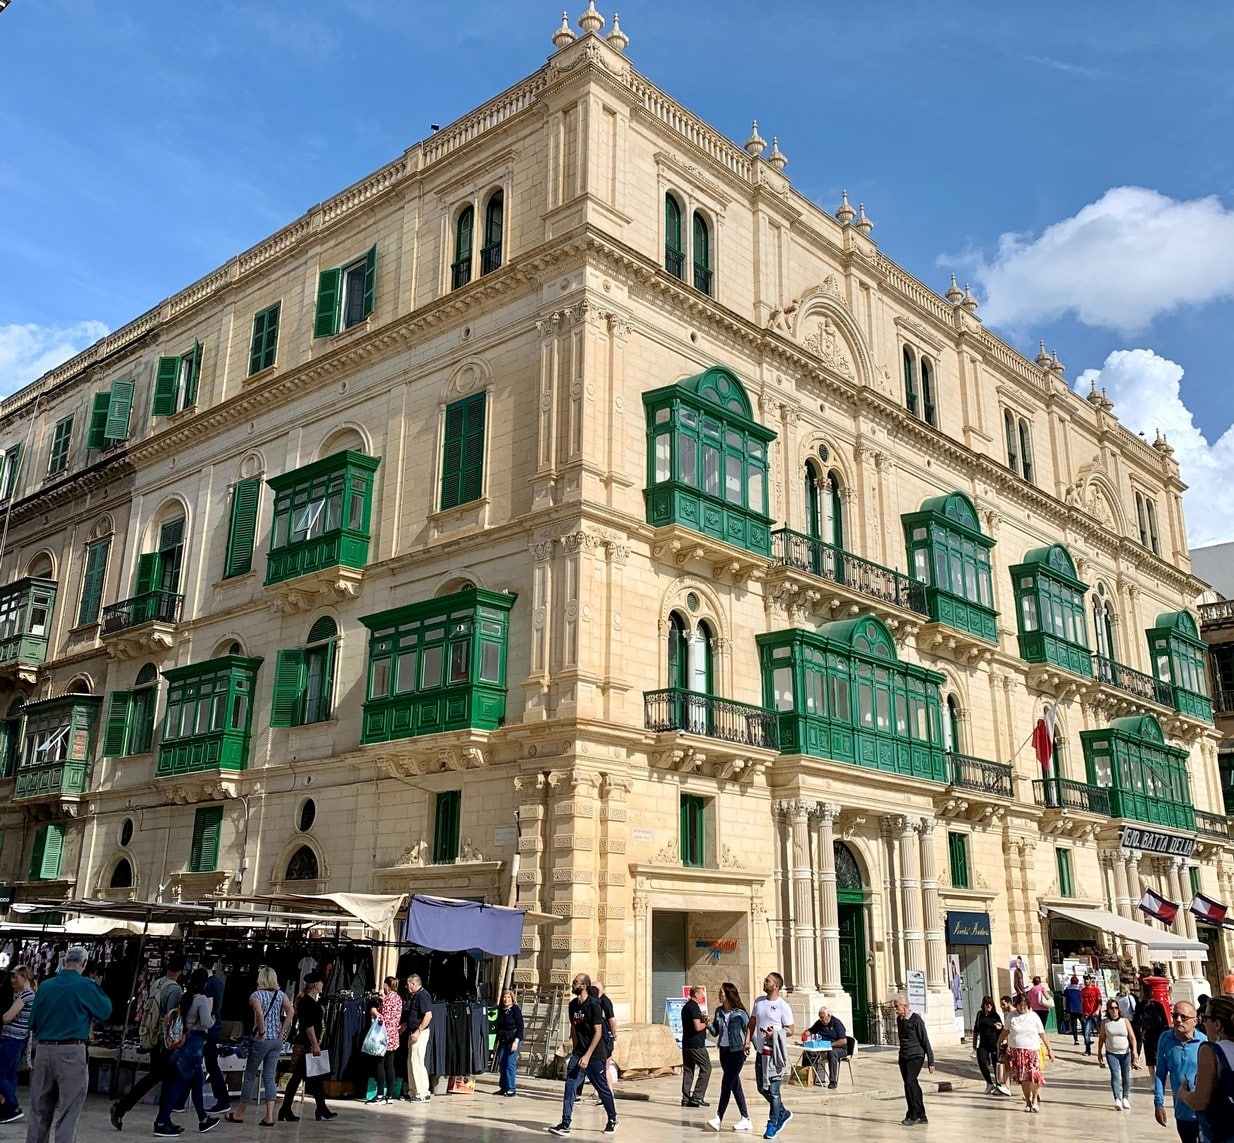 Malta Tour from Gozo to Rabat and Mdina 7